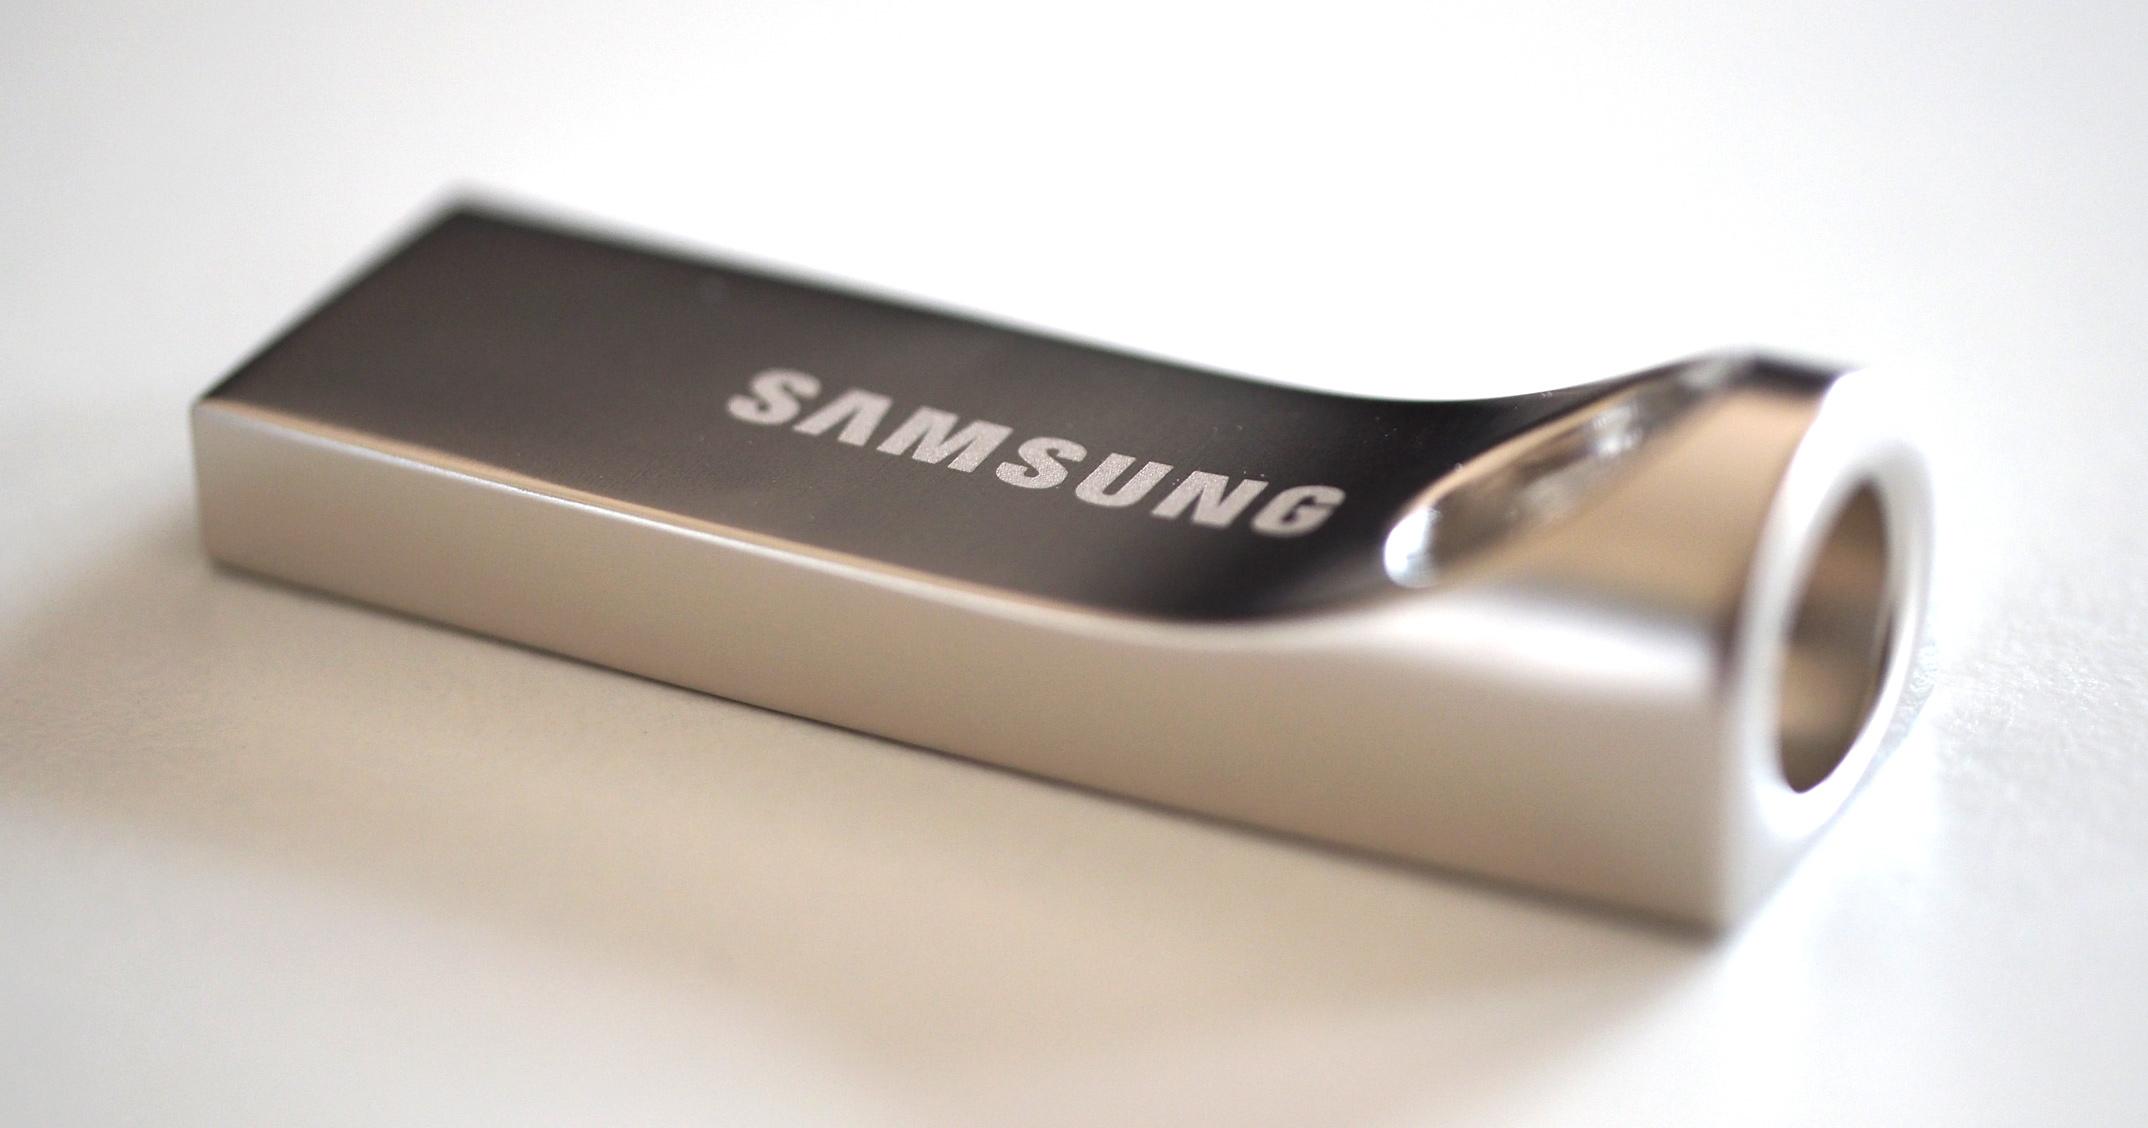 Samsung Usb 30 Flash Drive Review Flasdisk